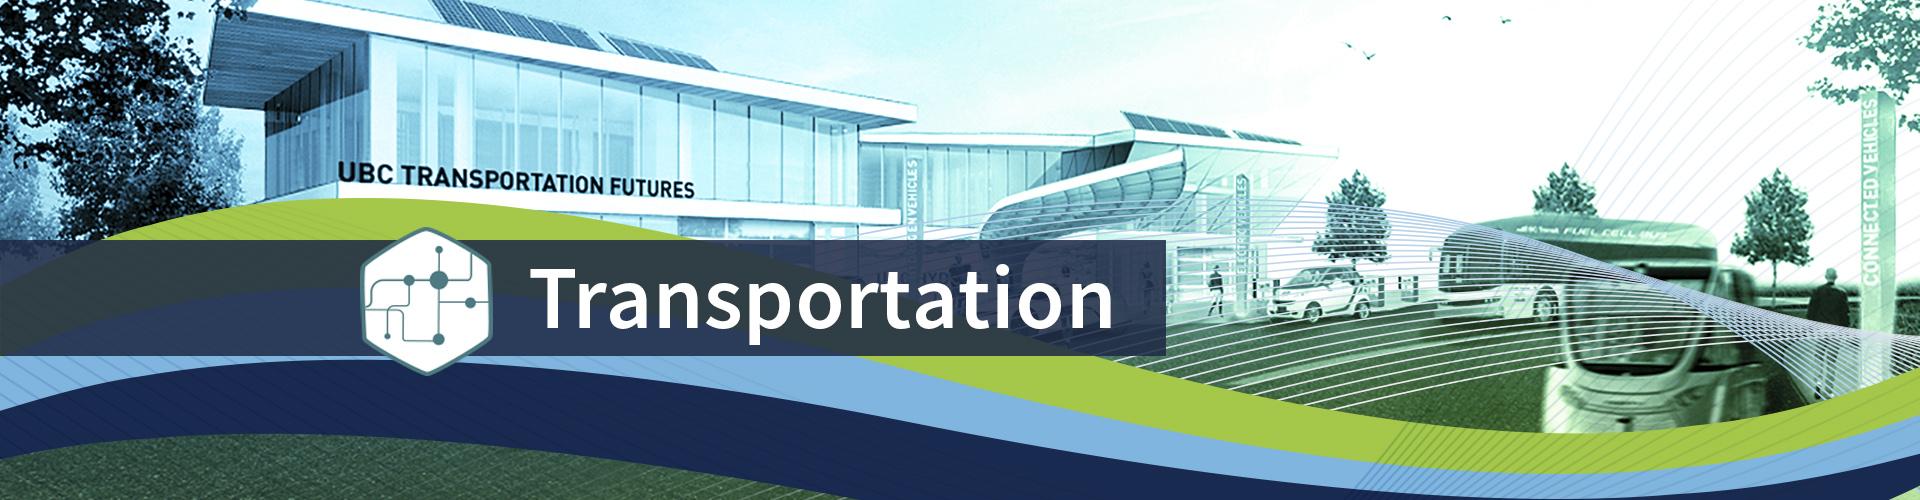 Transportation at UBC